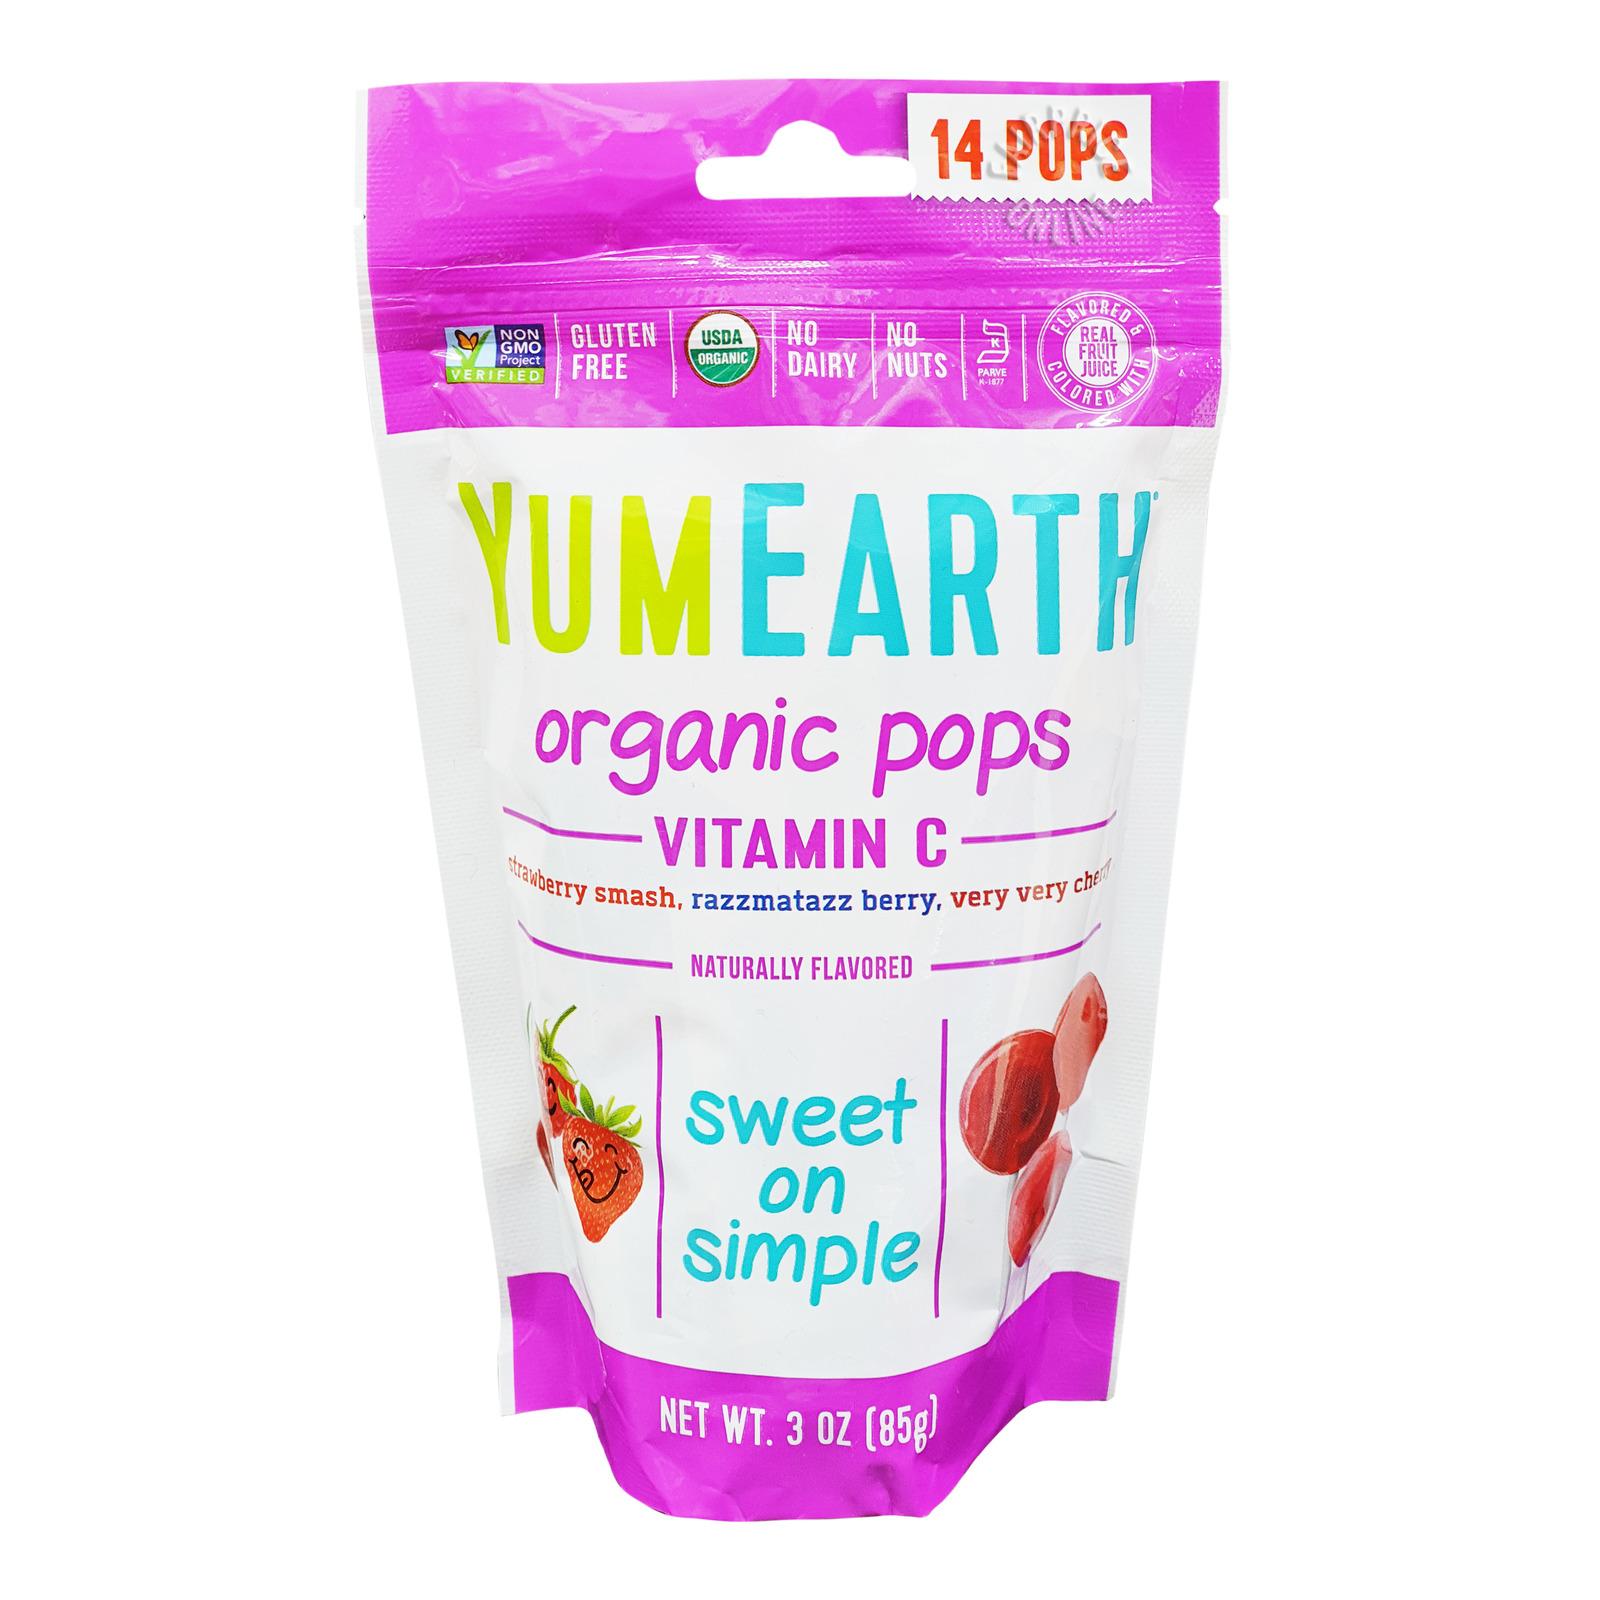 Yum Earth Organics Lollipops - Vitamin C Pops (Mixed Berries)